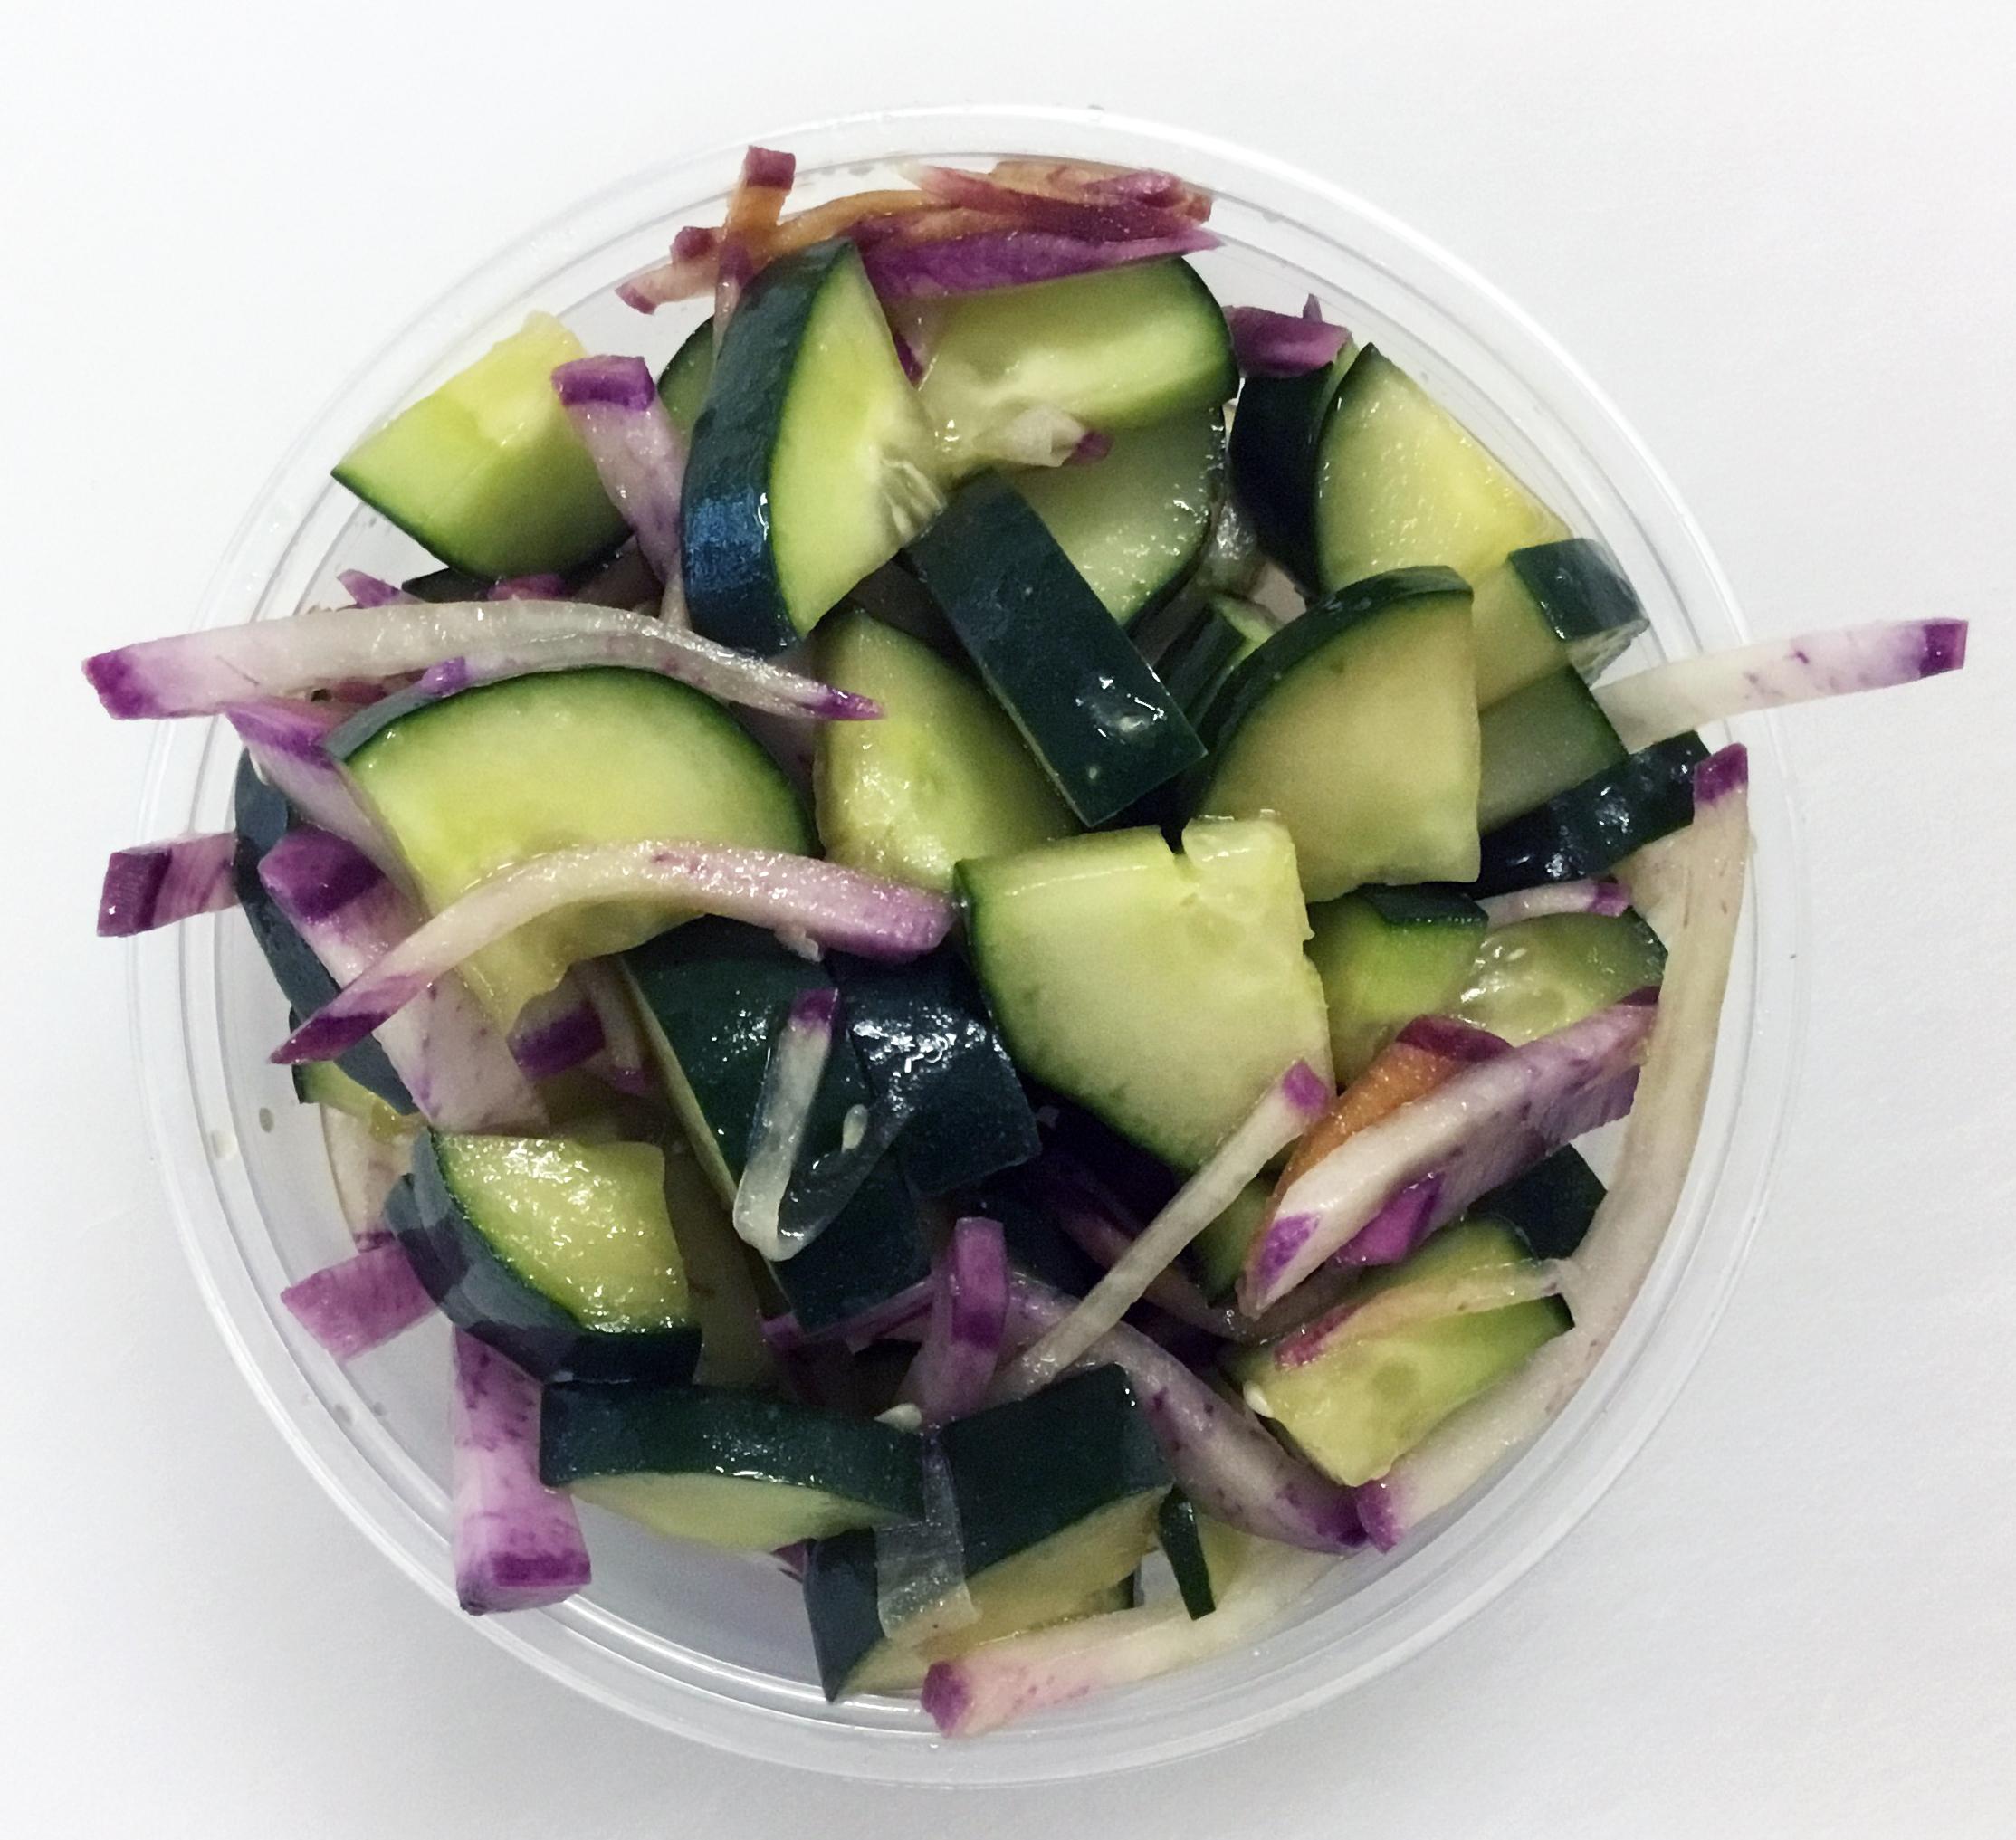 Cucumber and purple radish with tamari and olive oil.